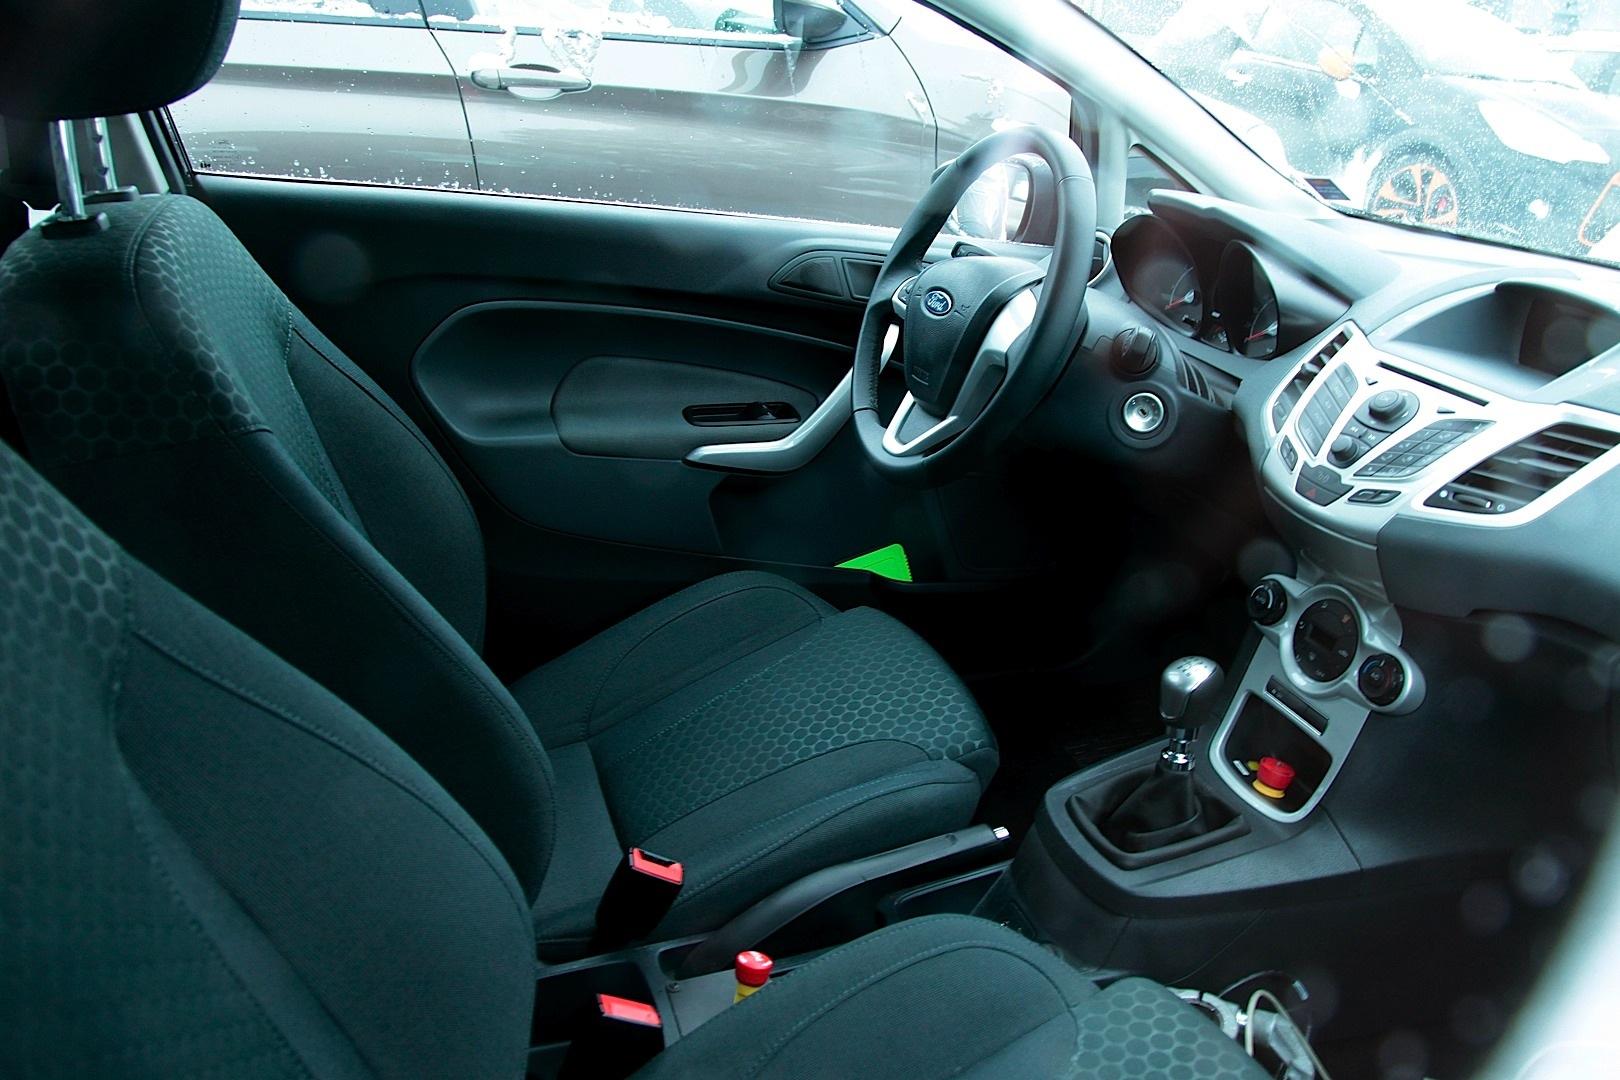 Spyshots: 2013 Ford Fiesta ST, Interior Revealed